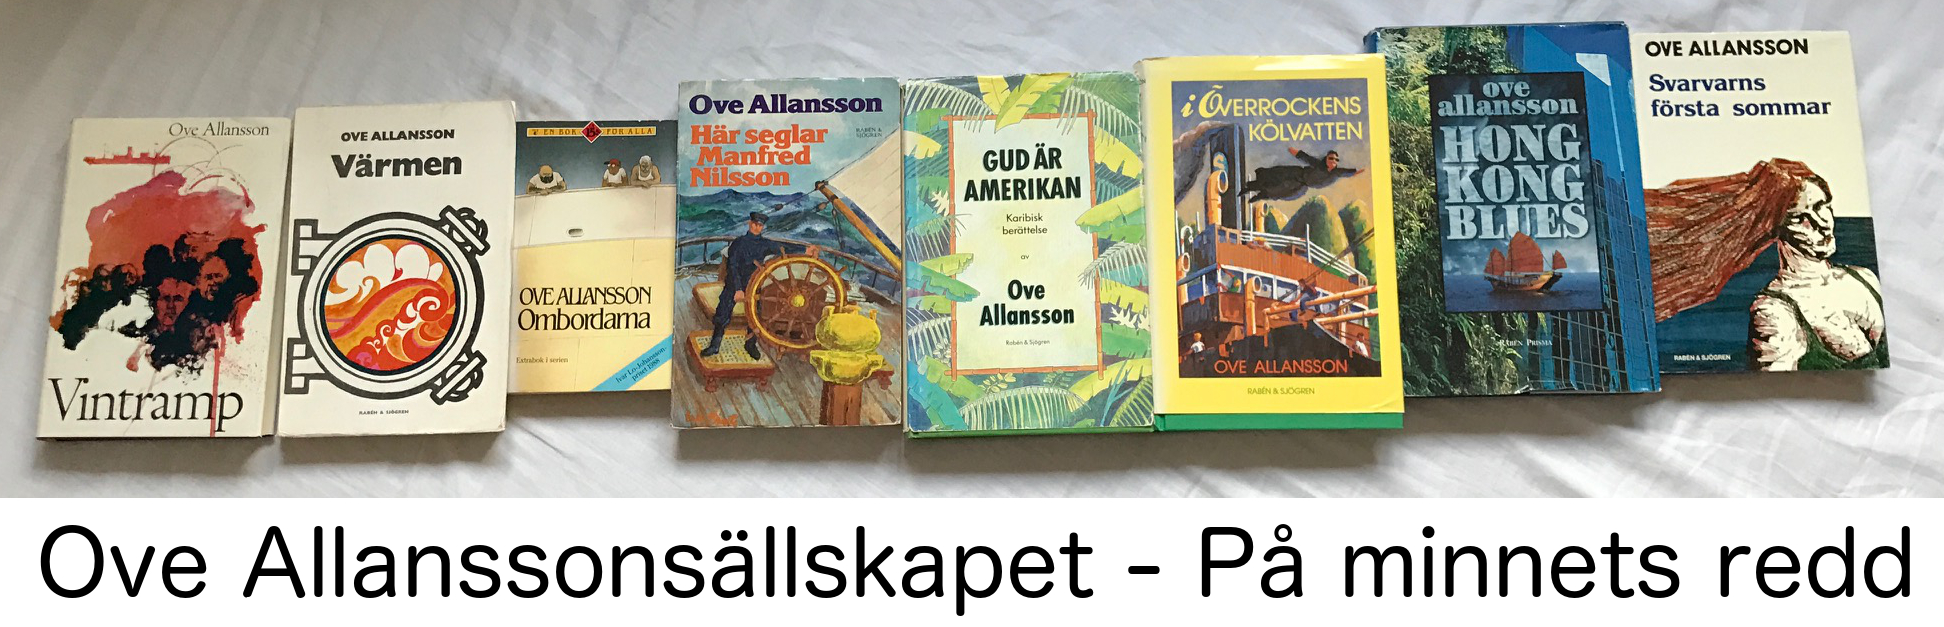 Ove Allanssonsällskapet – På minnets redd